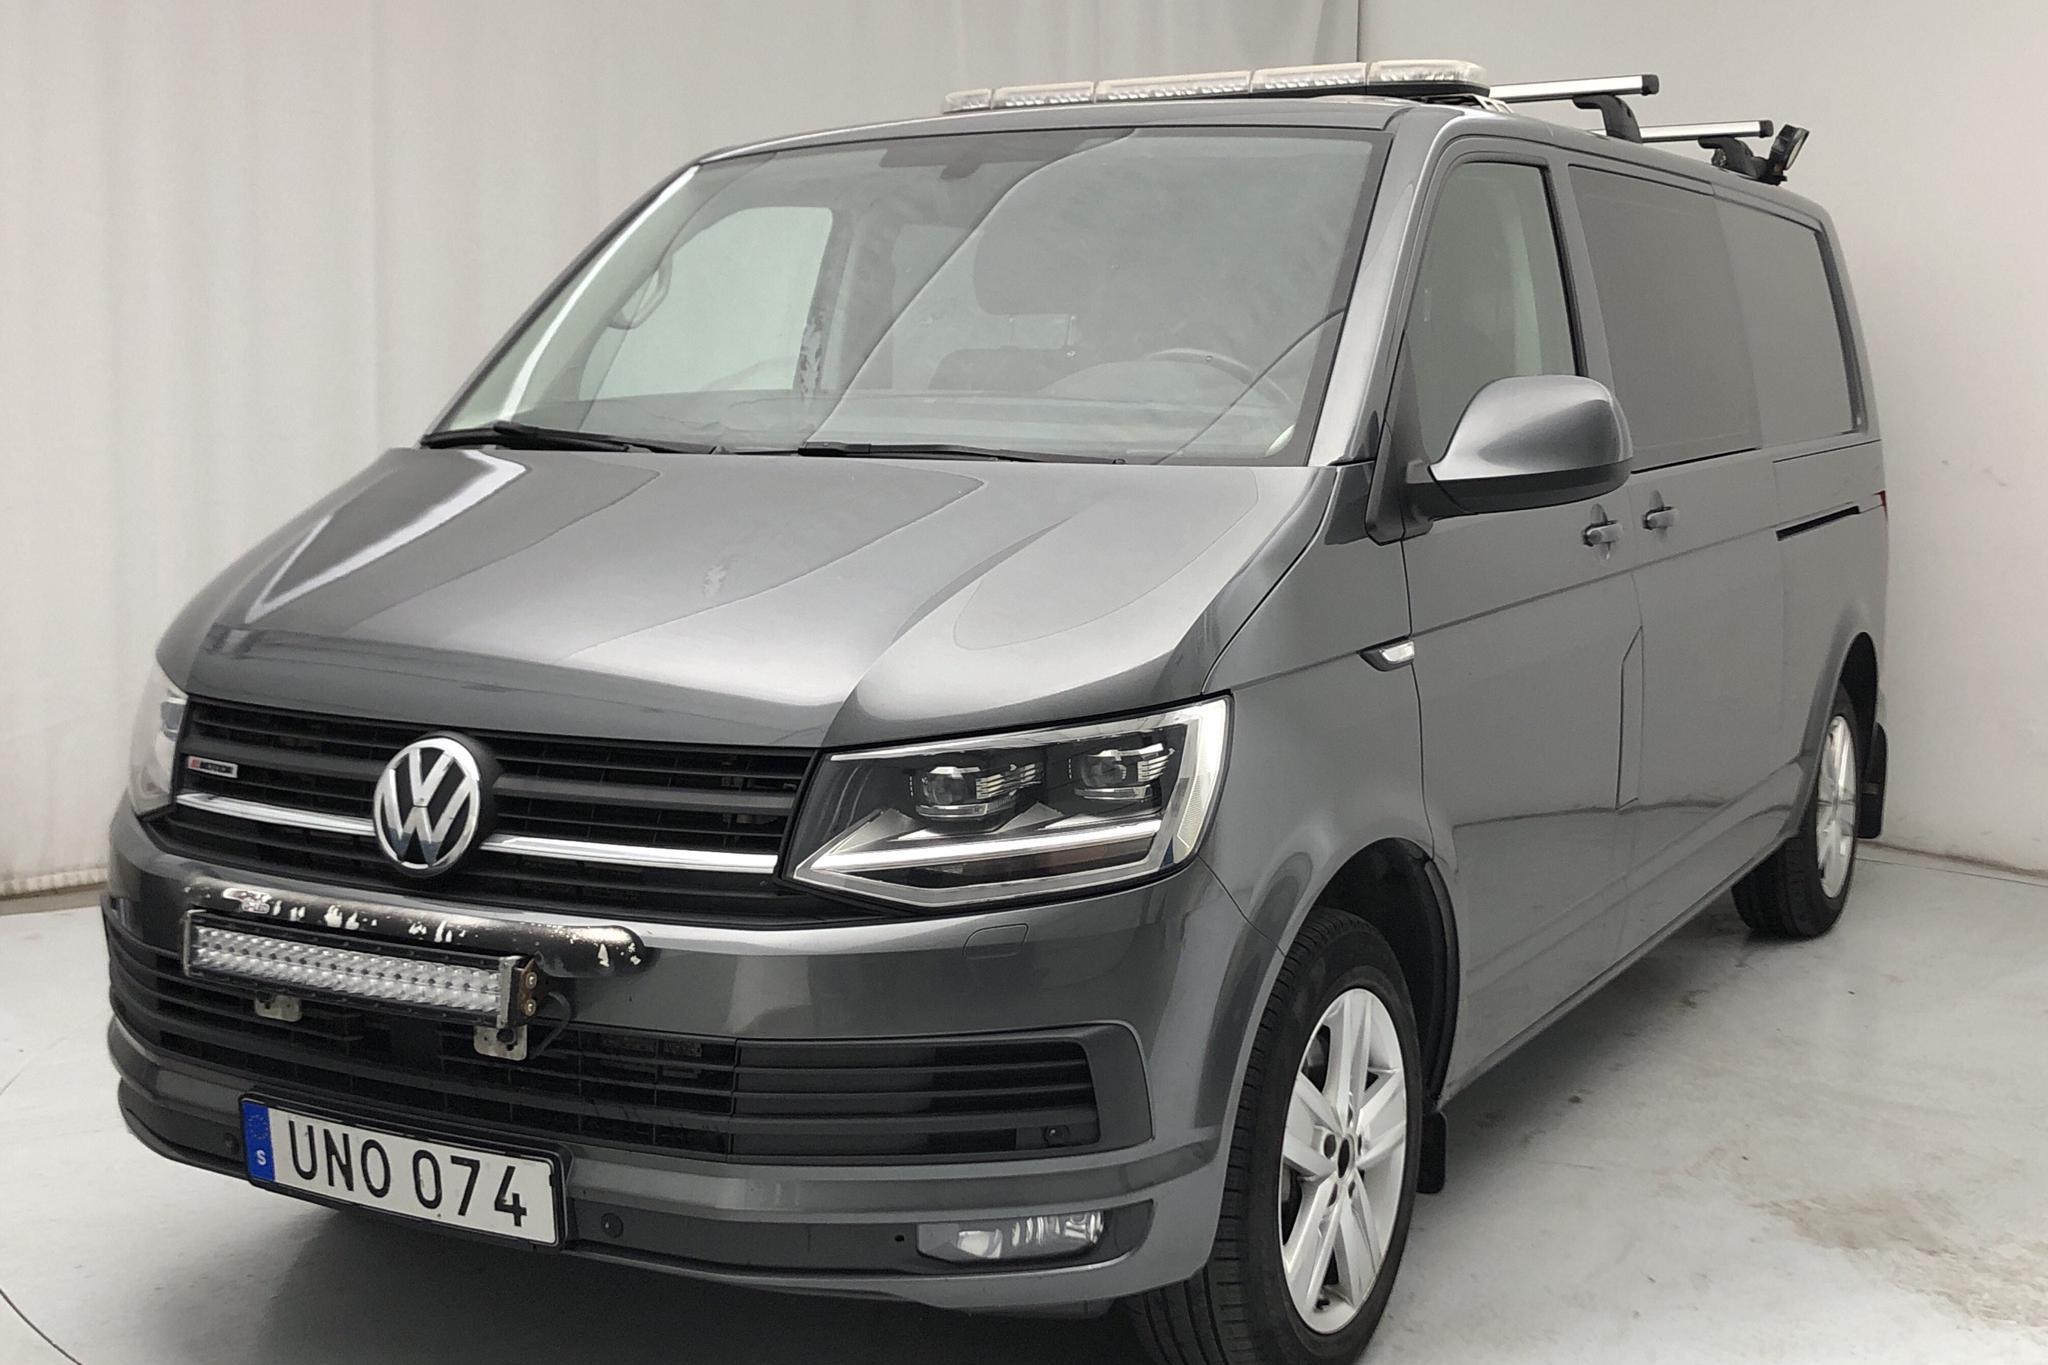 VW Transporter Kombi T6 2.0 TDI BMT 4MOTION (204hk)